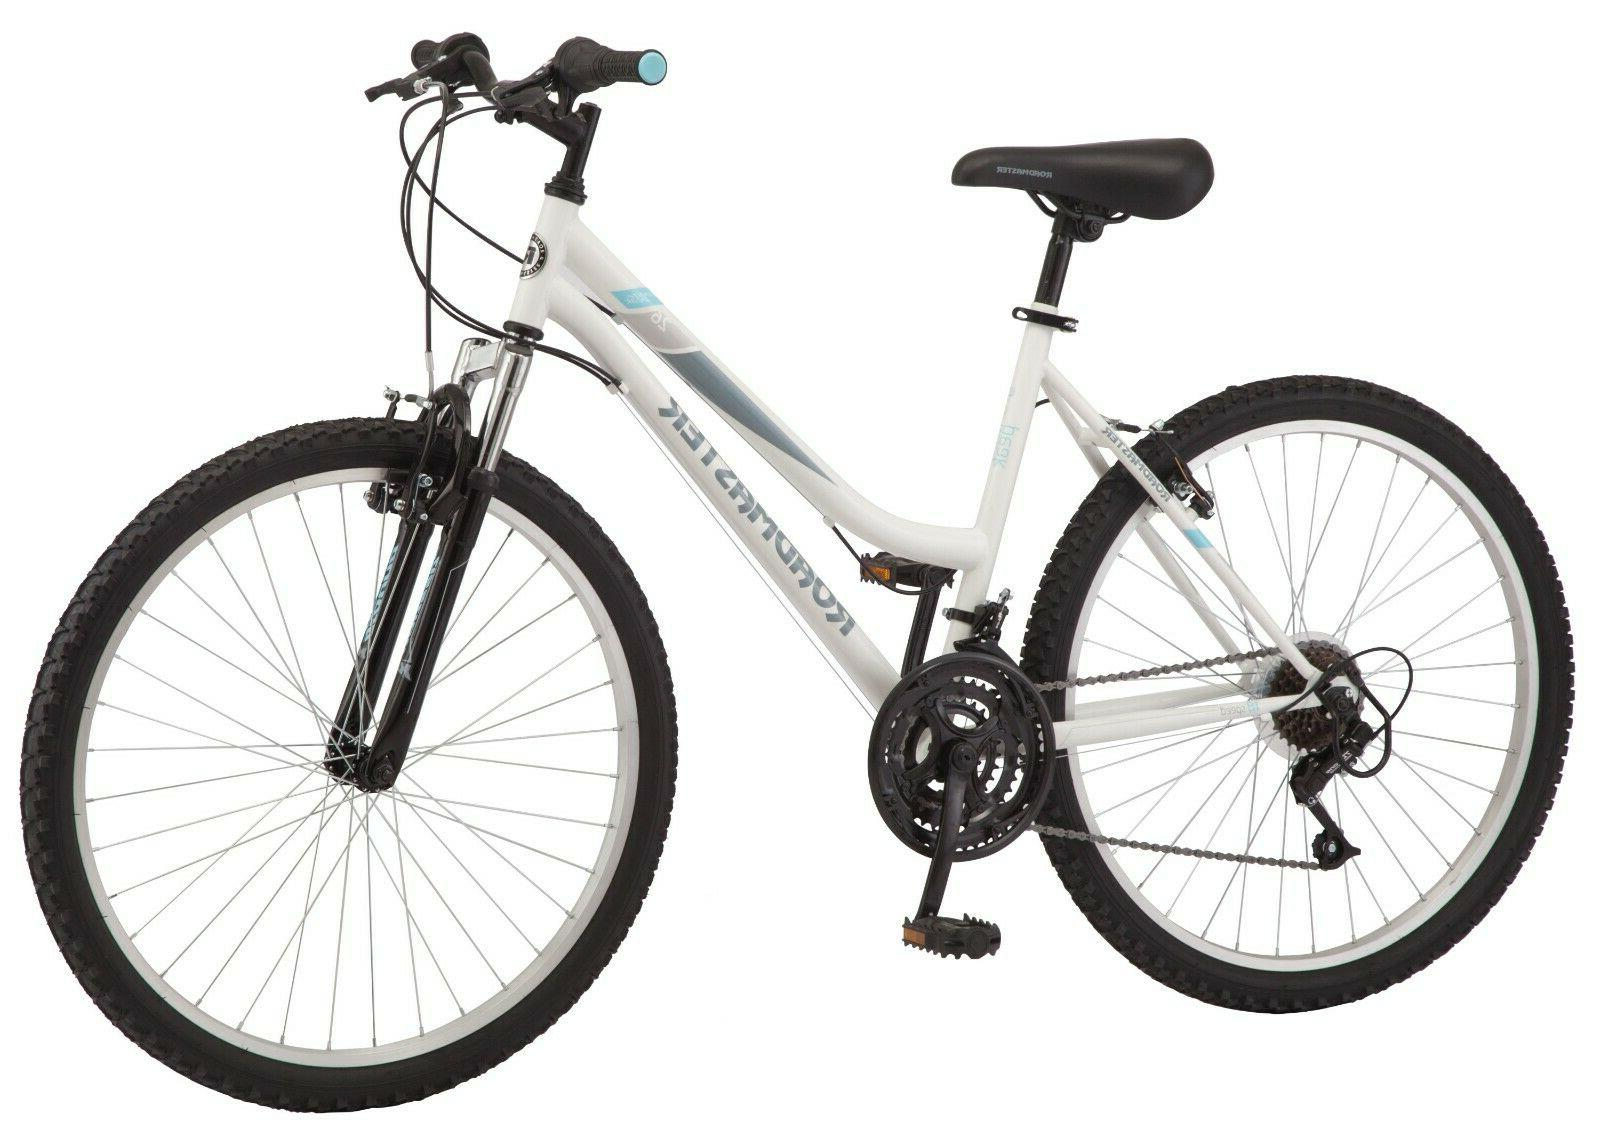 "ROADMASTER Granite Peak Women's Mountain Bike - 26"" wheels"